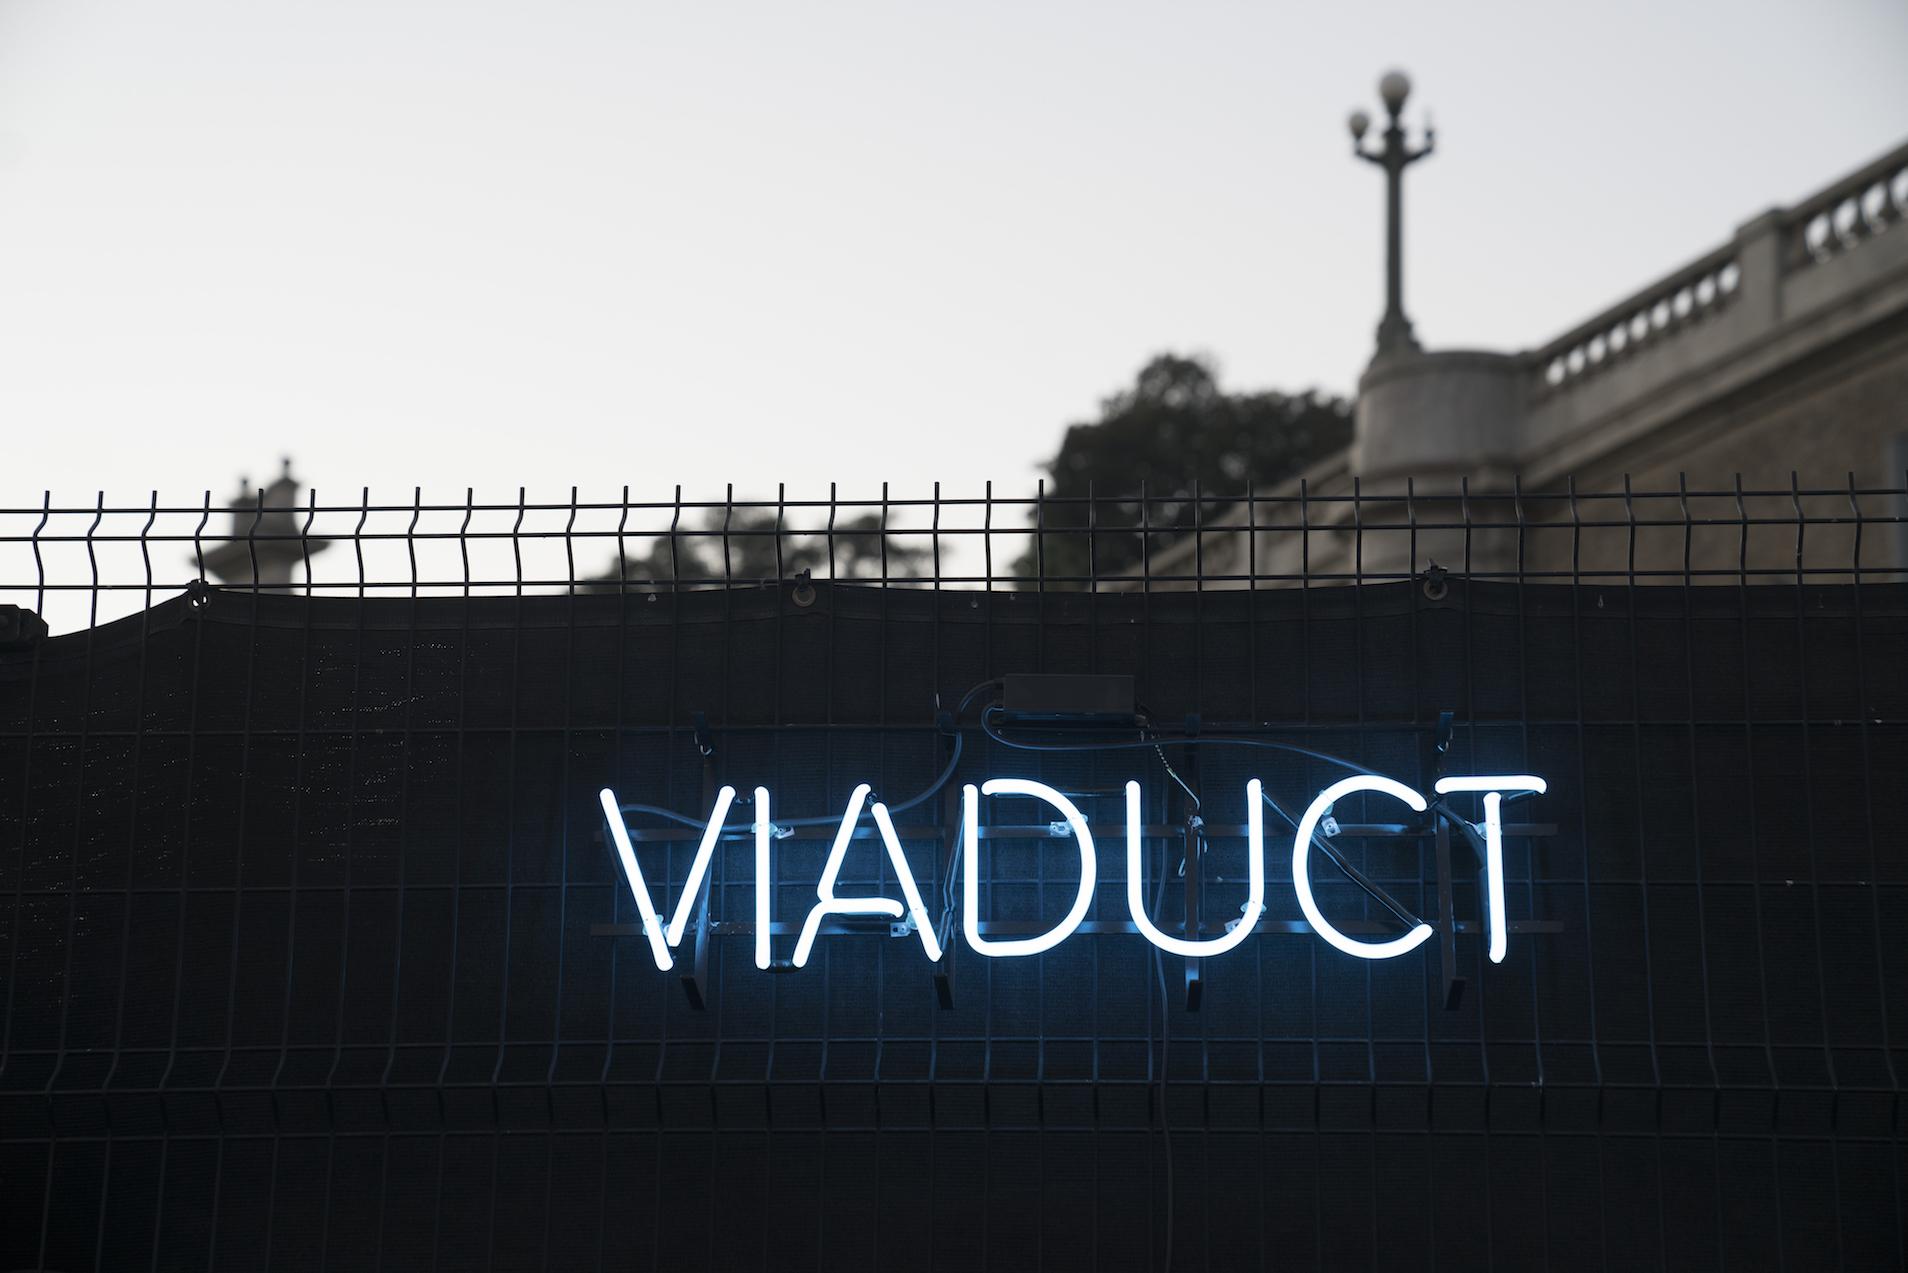 Viaduct sign 2.jpeg